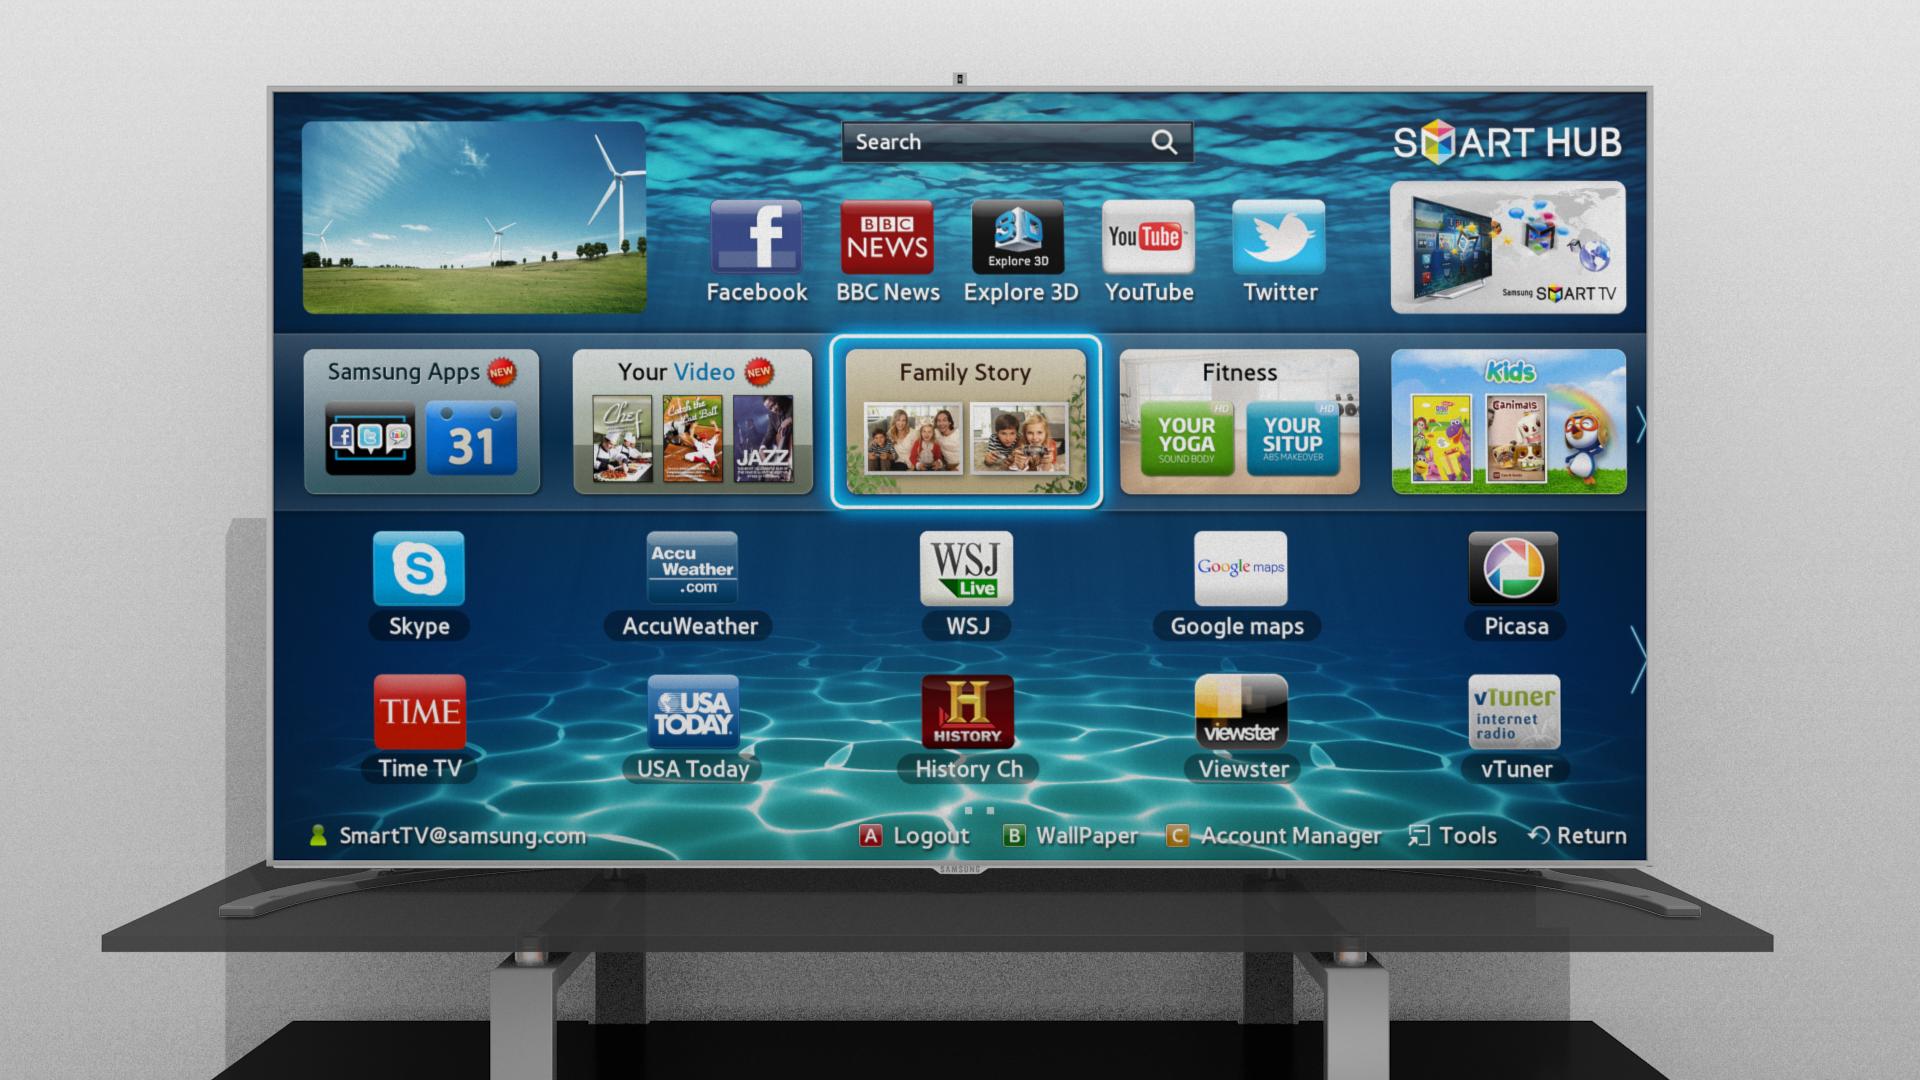 Samsung Smart Tv 39876 Model Obj Mtl Fbx Blend Dae 4